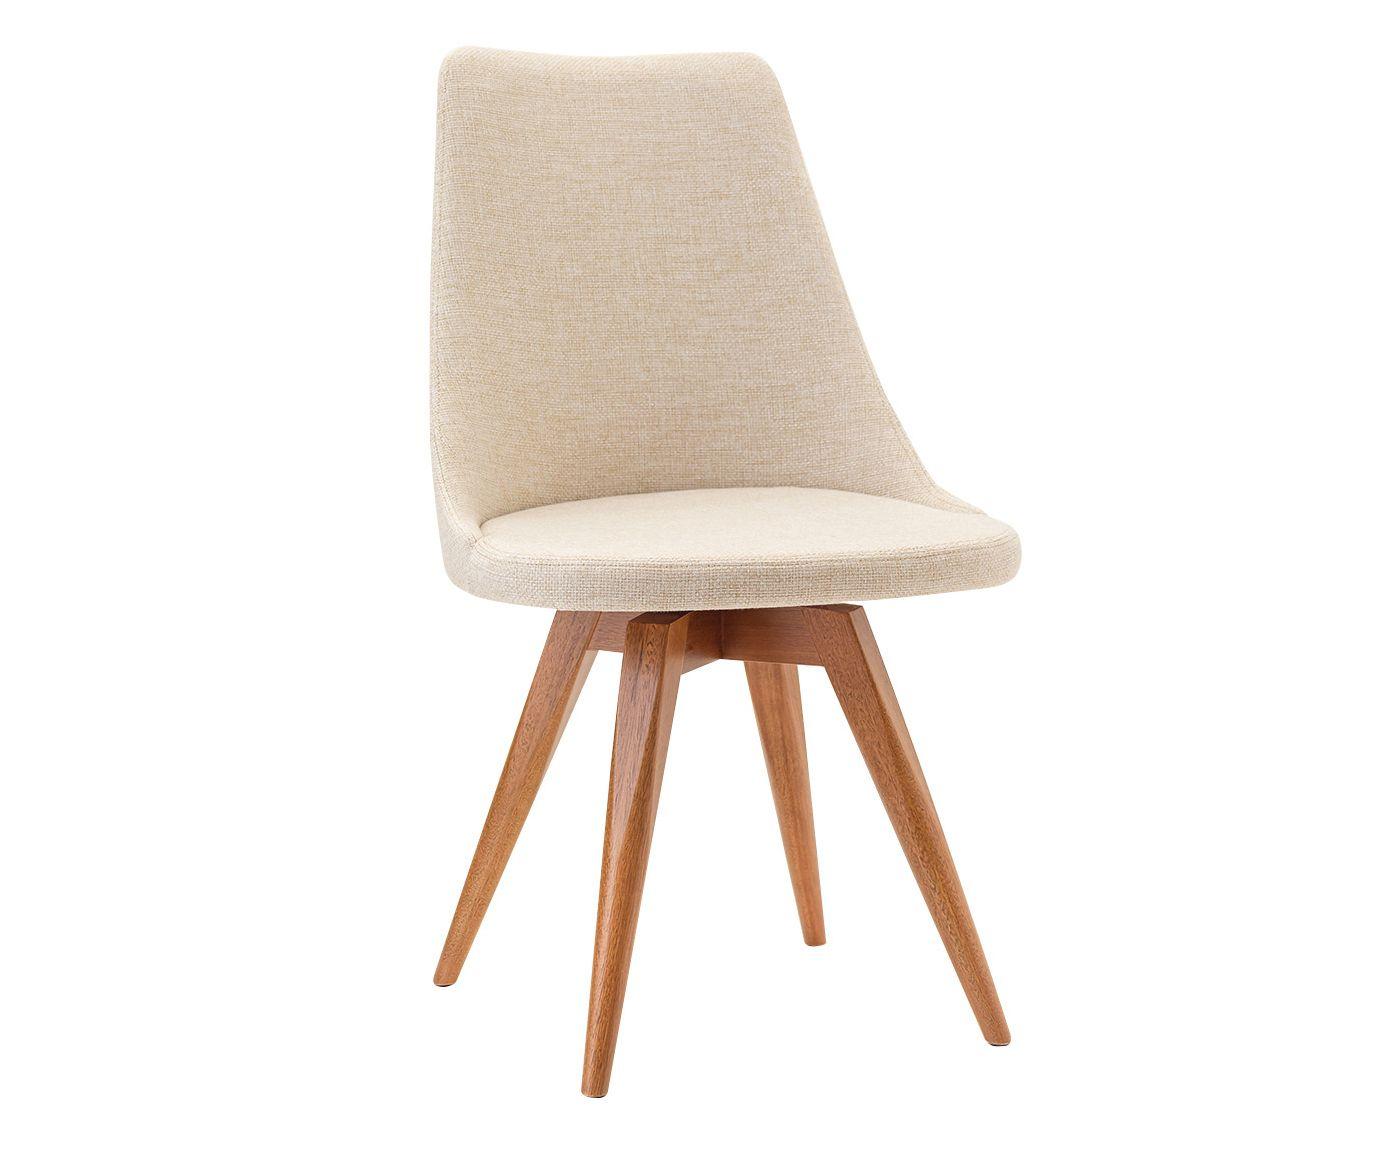 Cadeira Fixa Ella Creme Claro - 53X91X55cm | Westwing.com.br